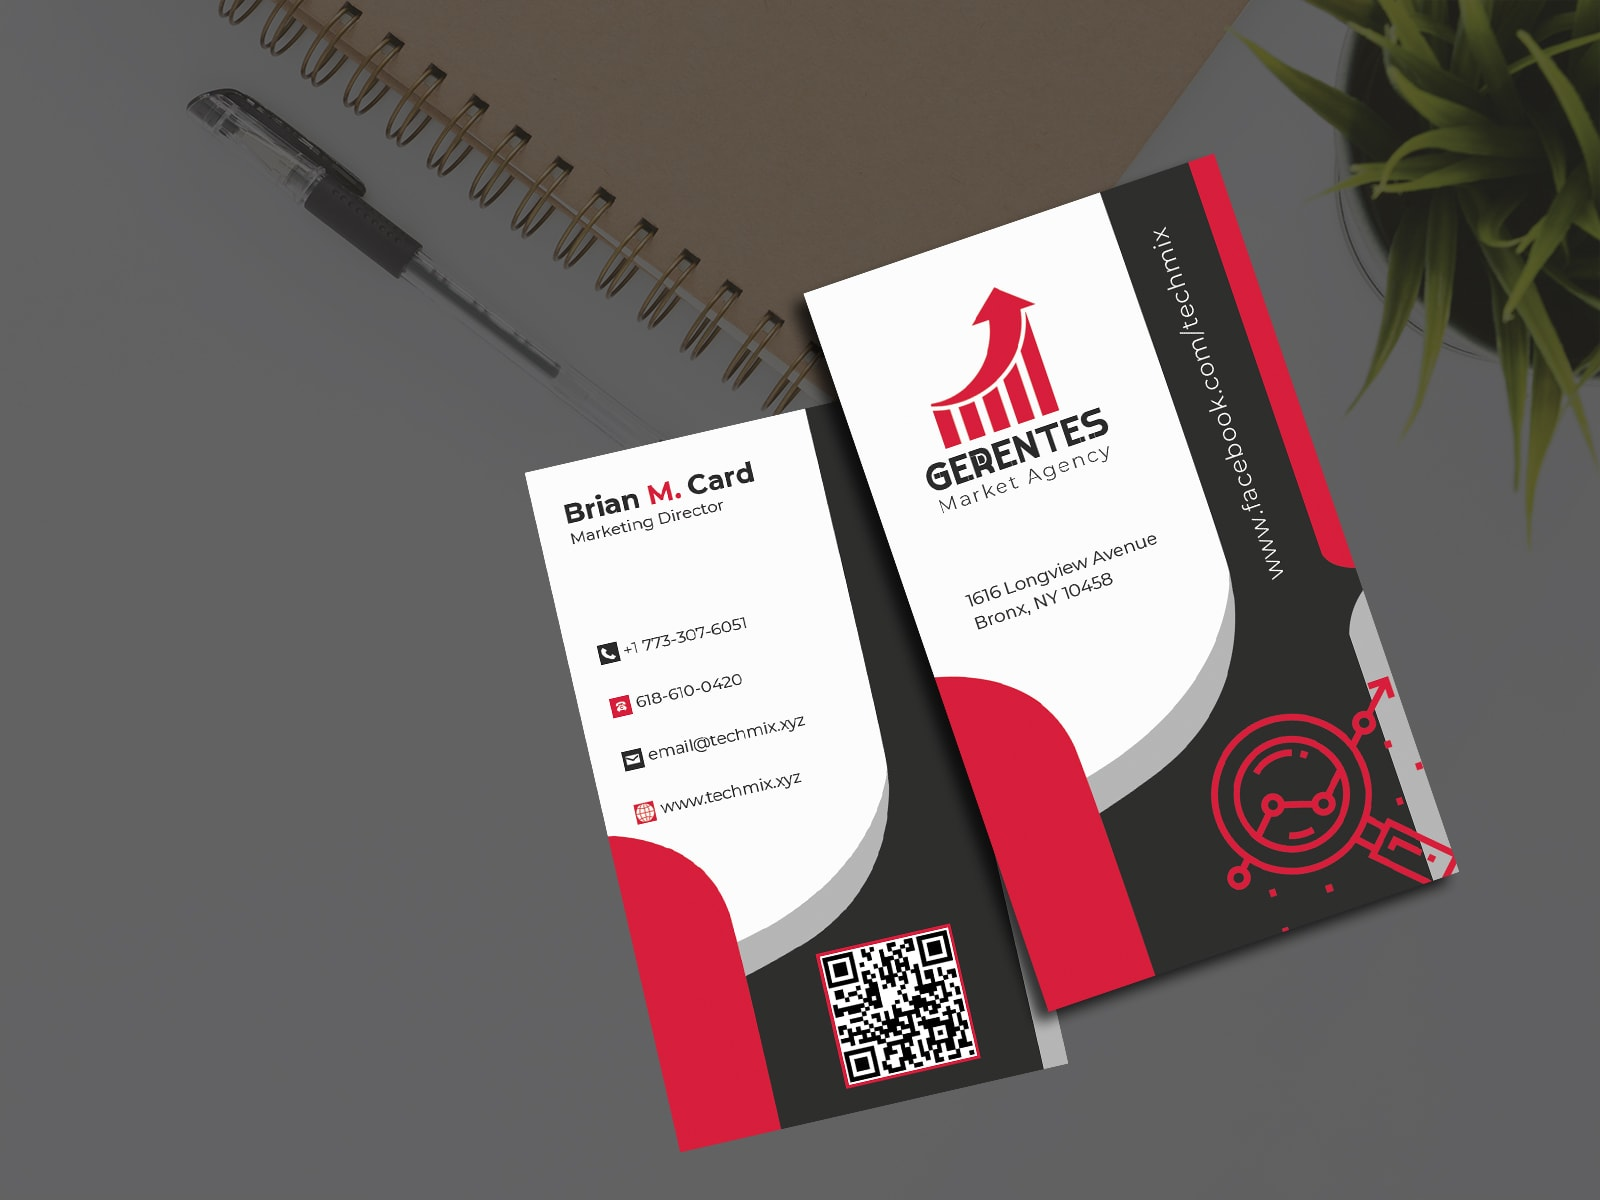 Digital Marketing Agency Business Card